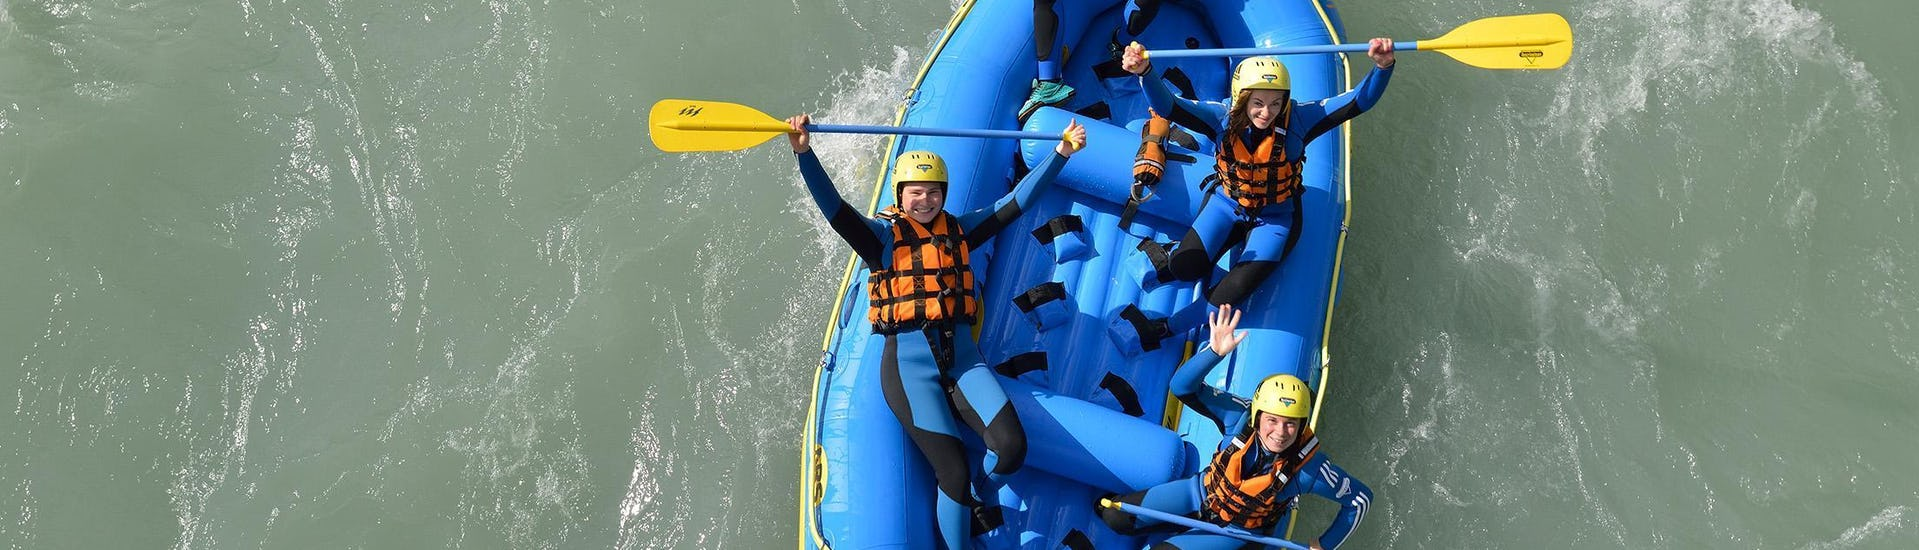 rafting-girls-trip---imster-schlucht-faszinatour-hero